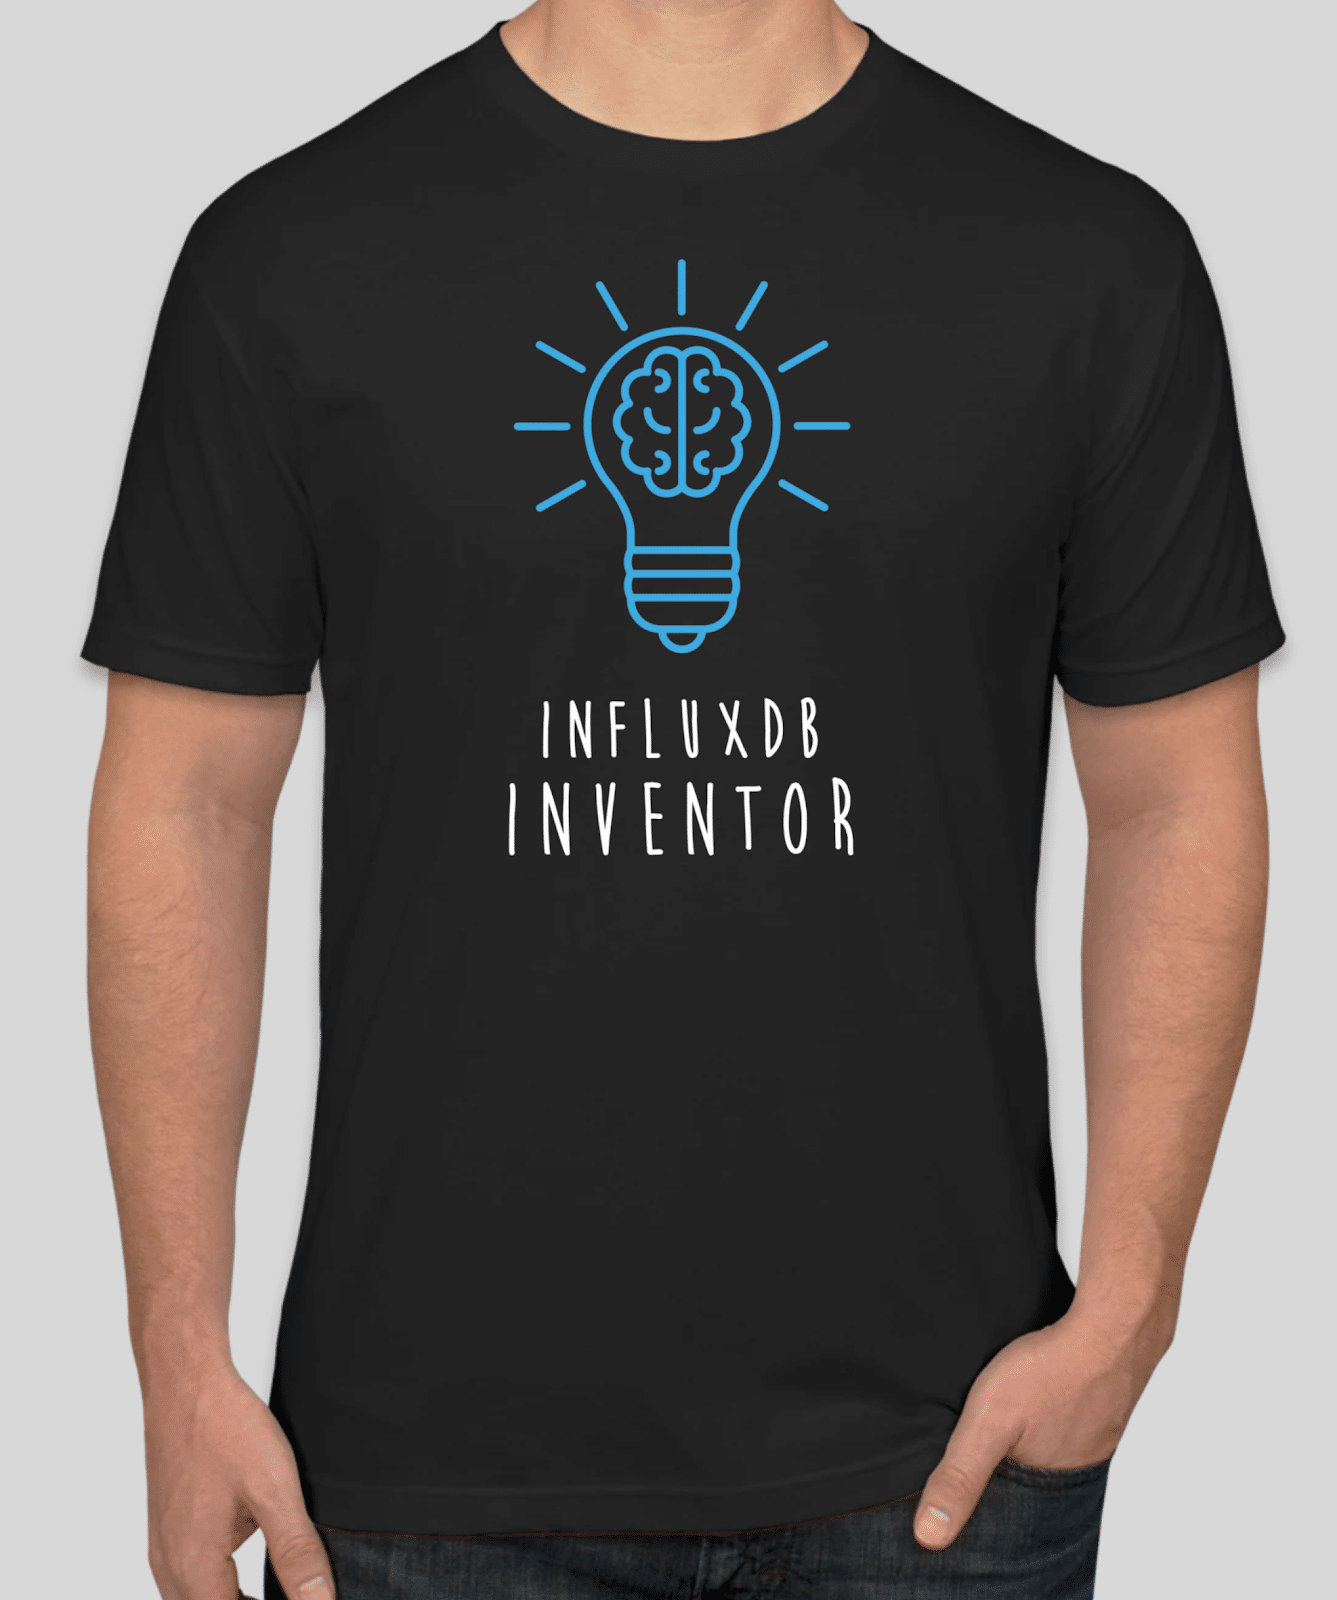 influxdb inventor t-shirt